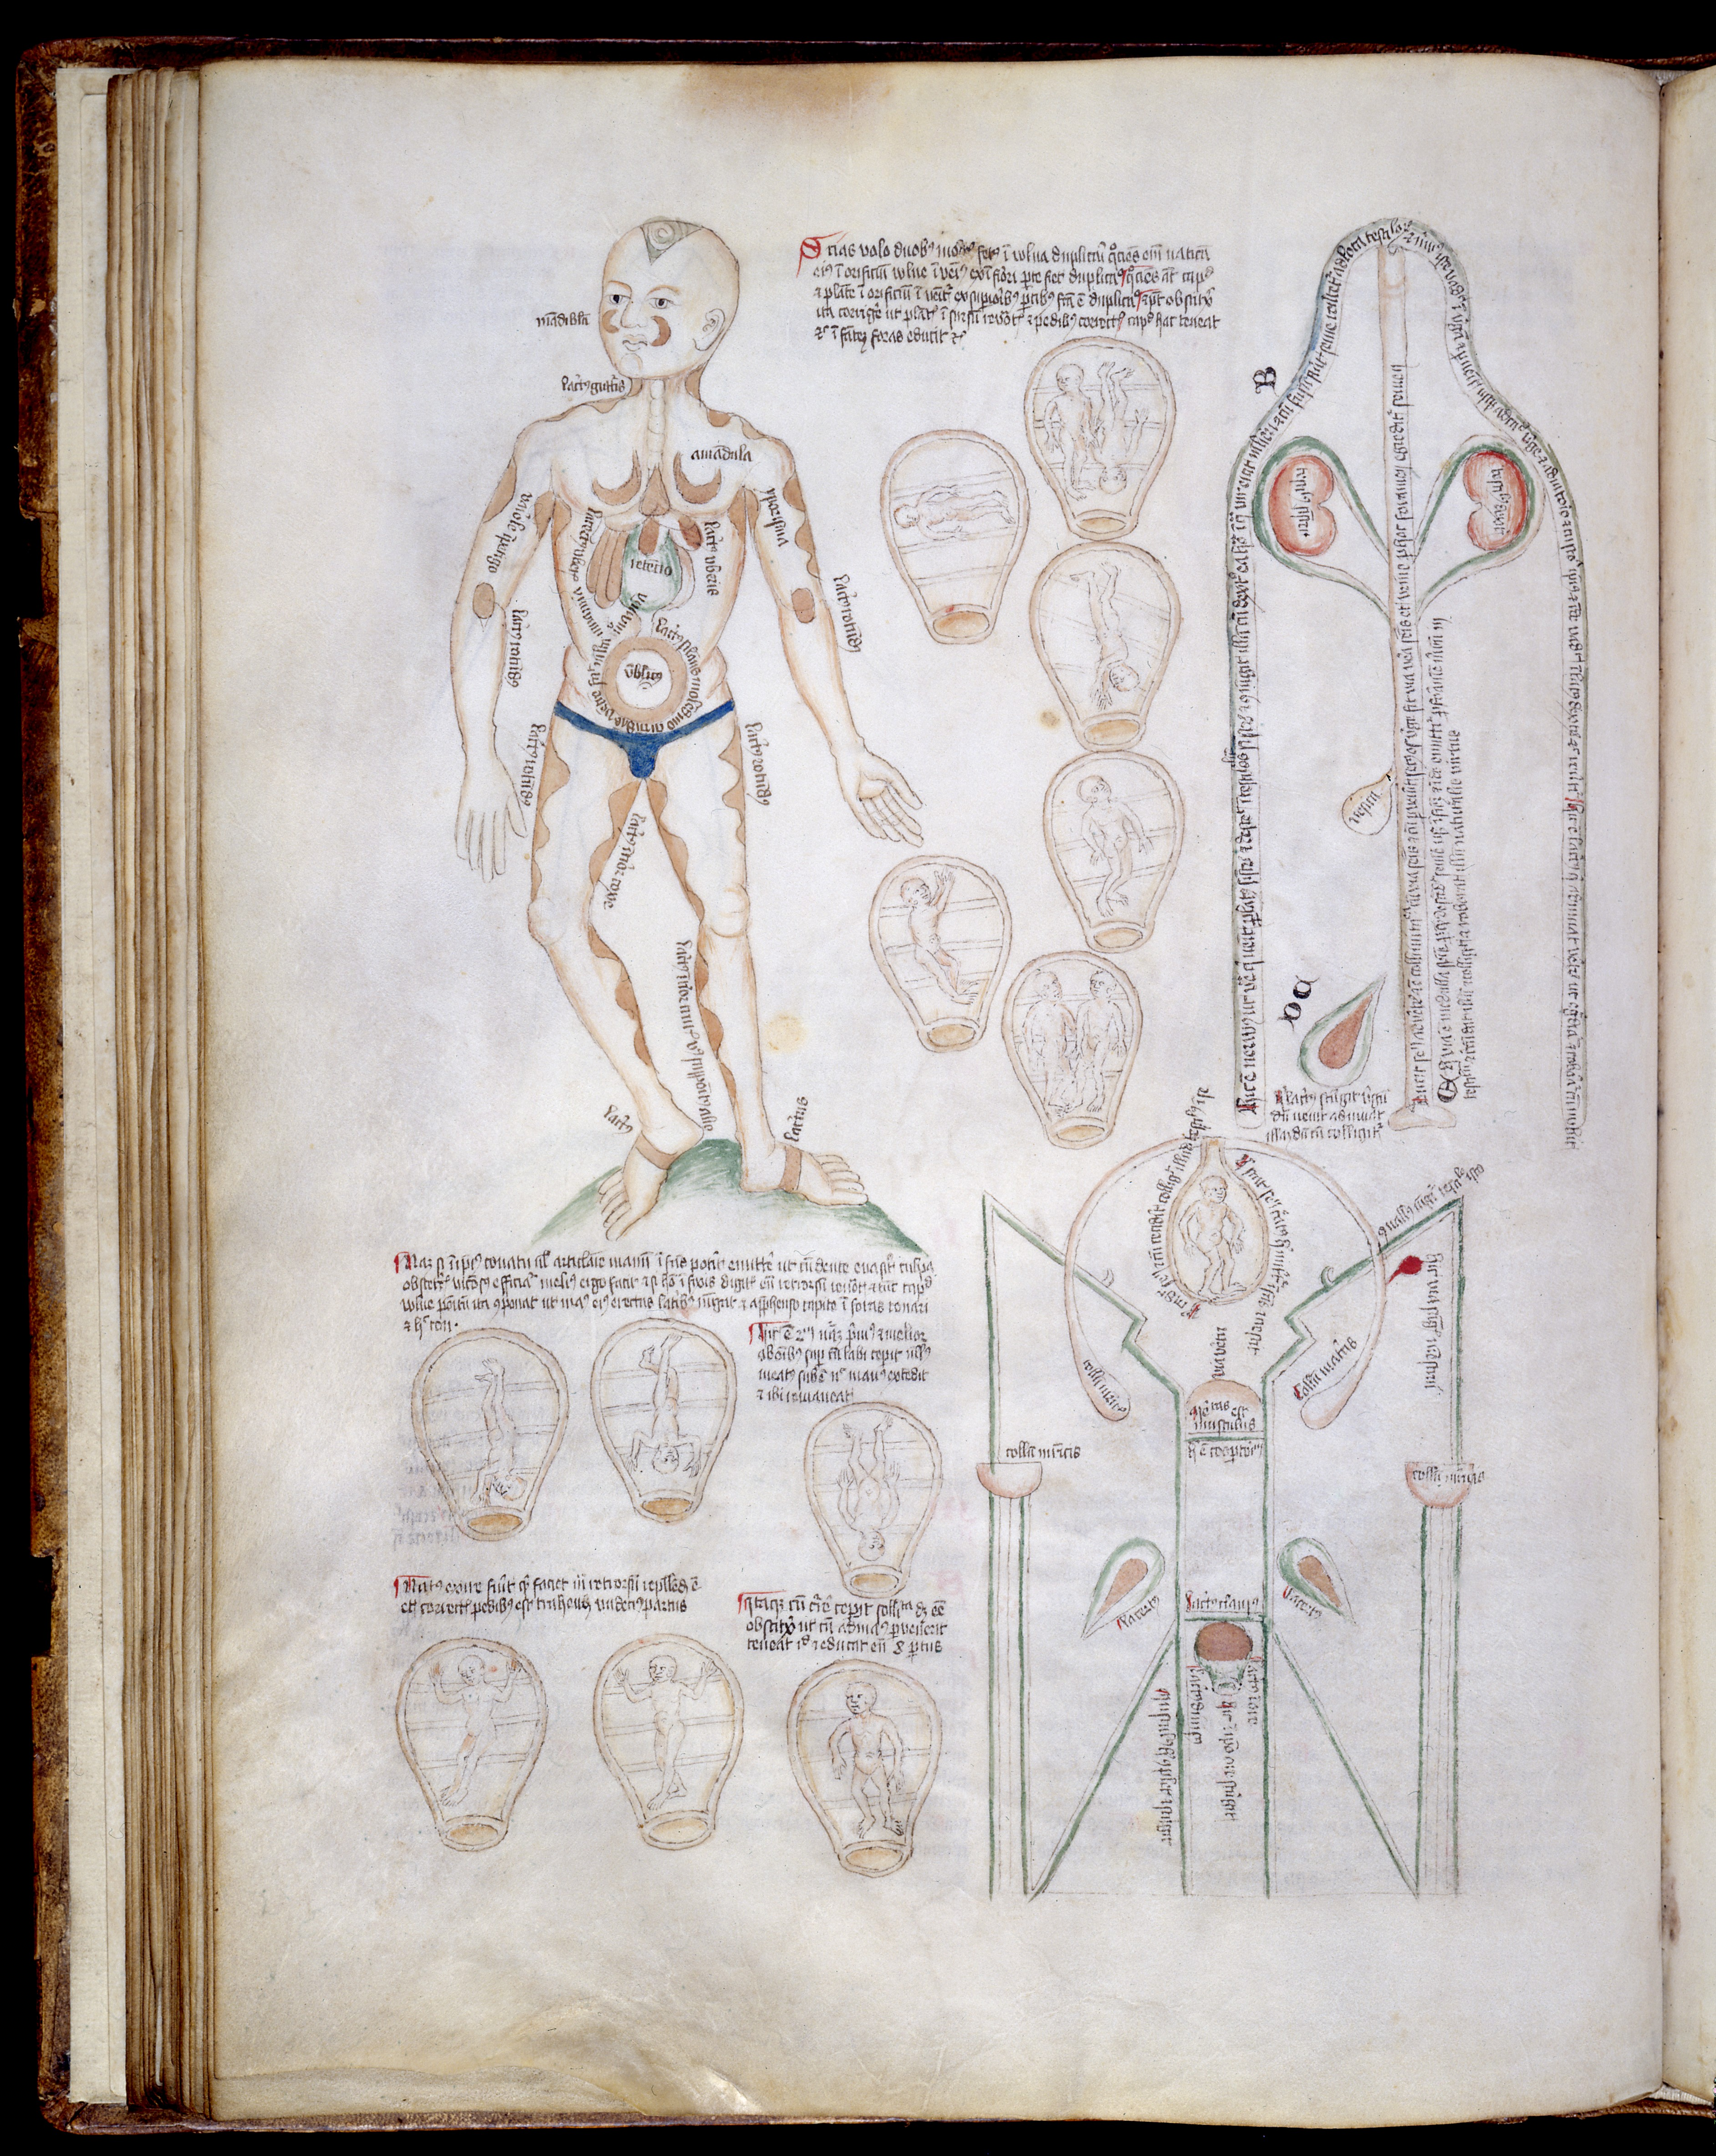 Filemuscle Man Foetal Positions In Uterus Female Anatomy Wellcome